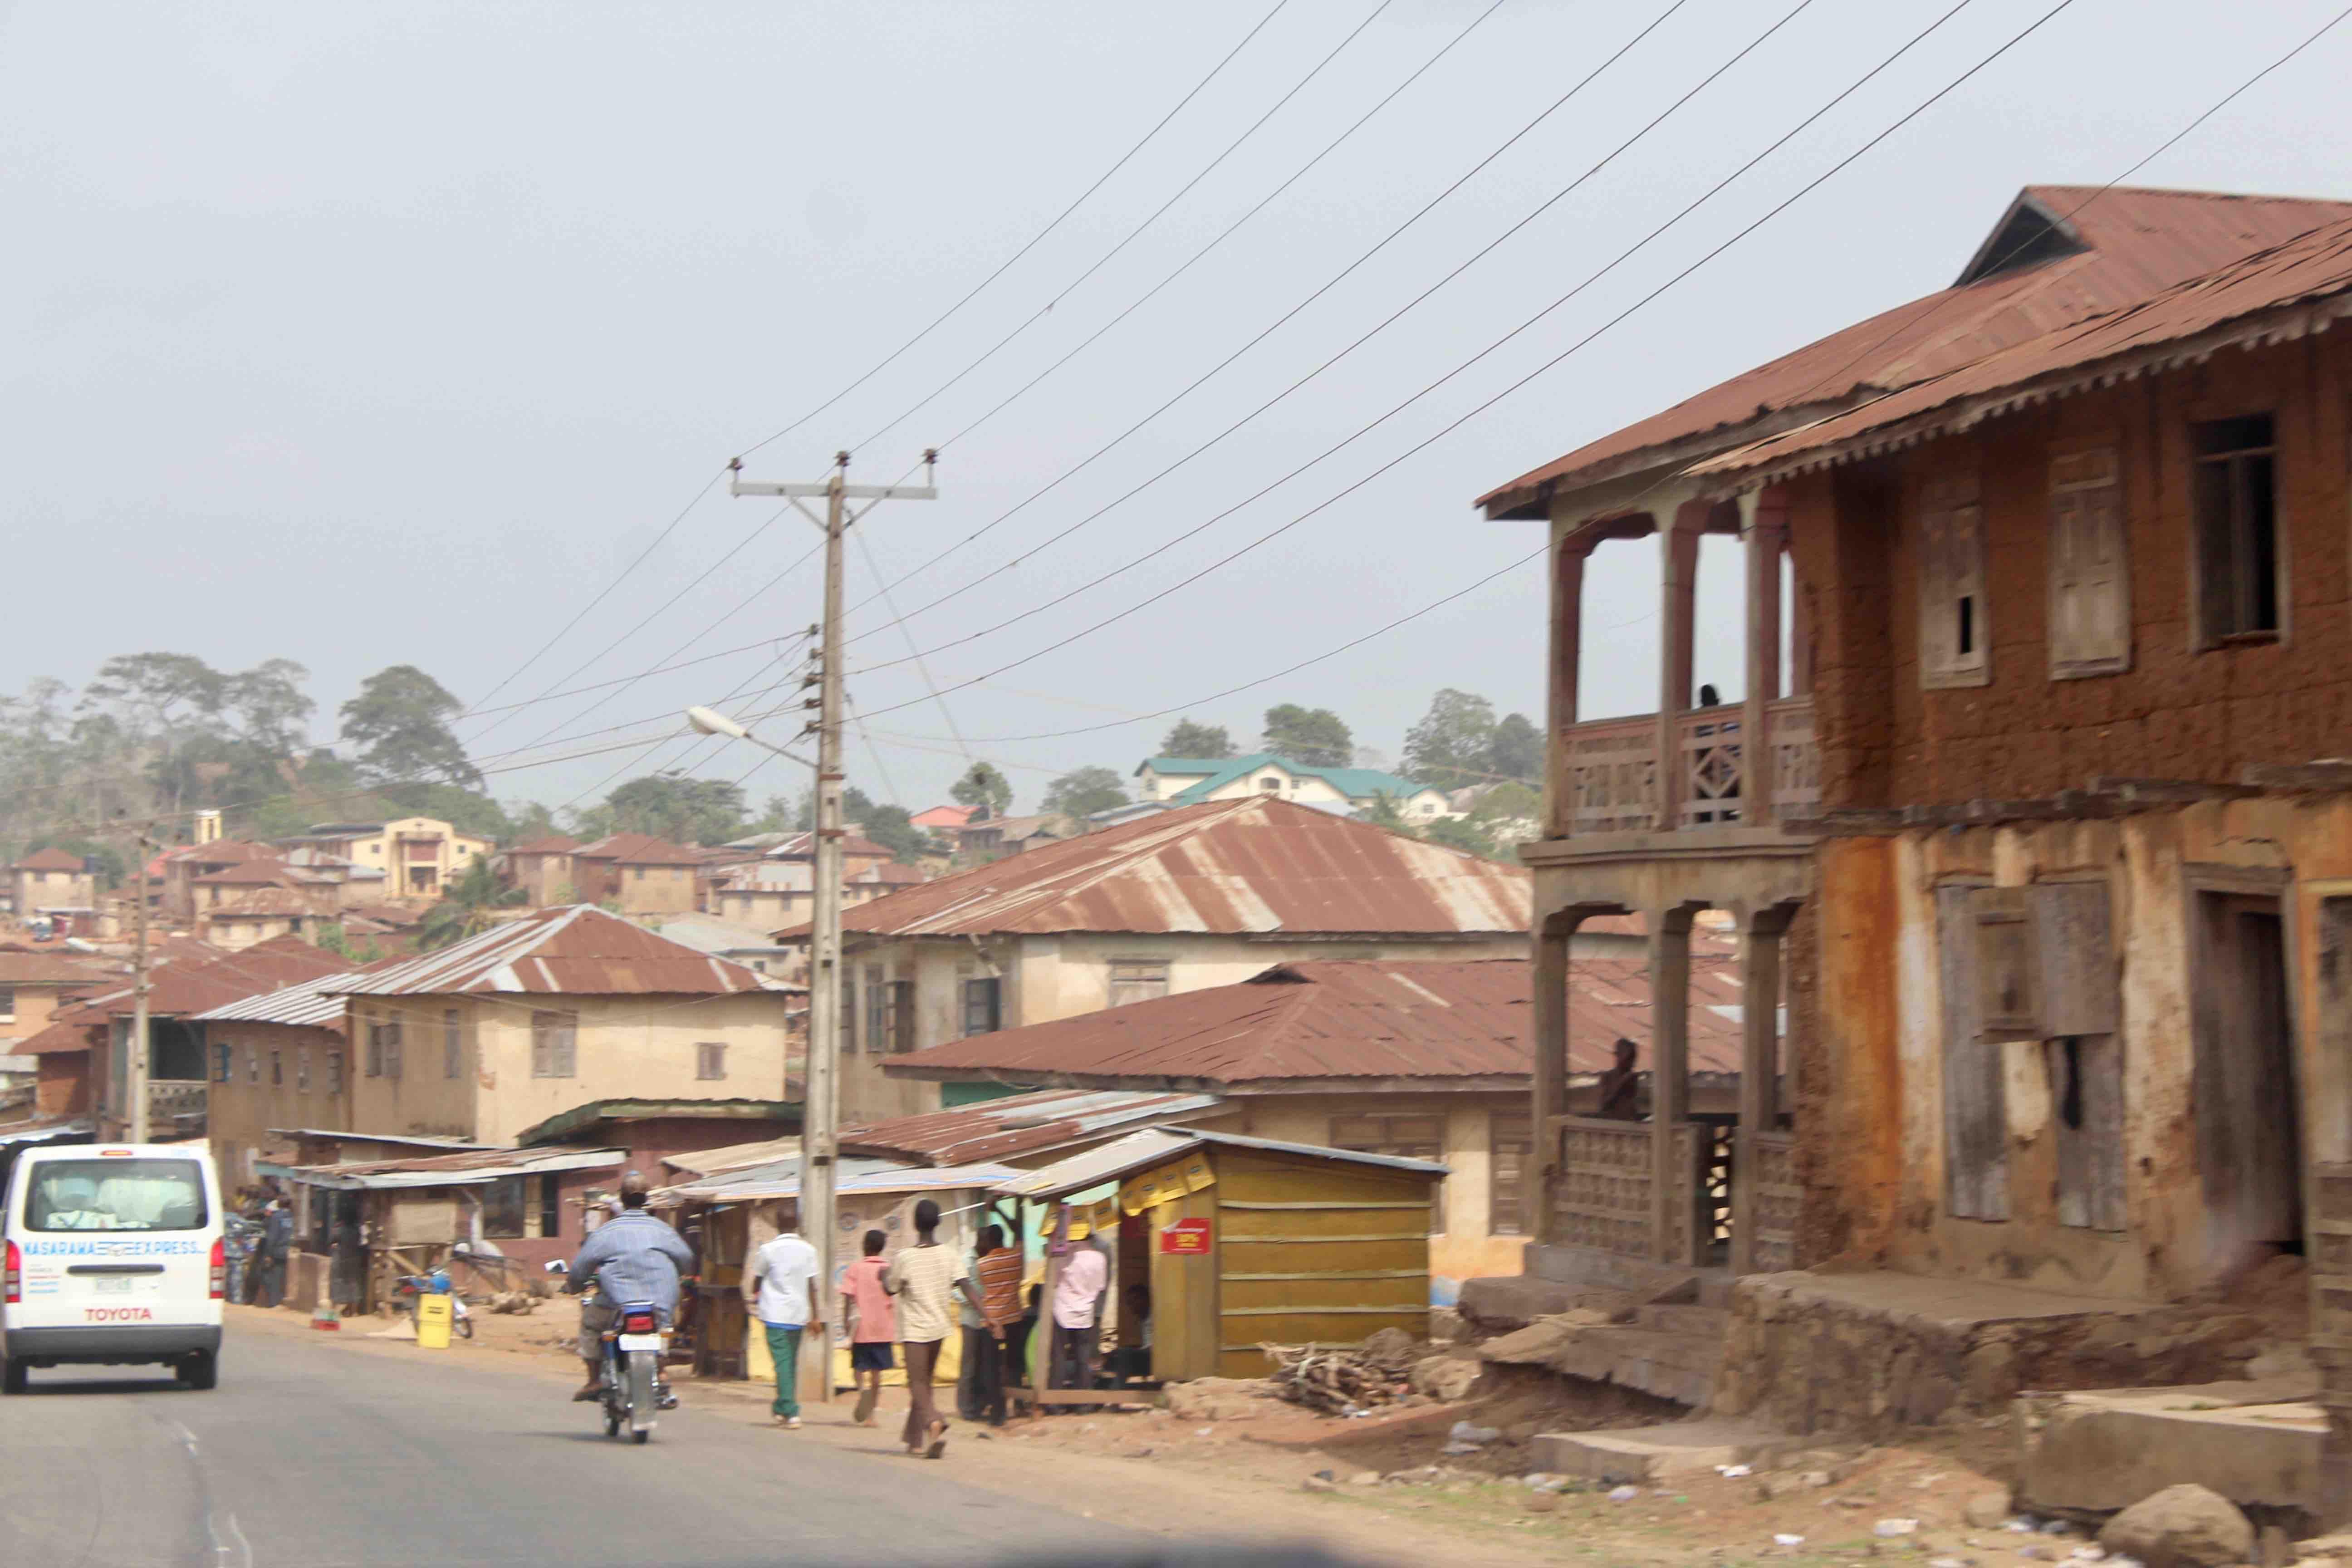 Oka, Ondo State, Nigeria. #JujuFilms